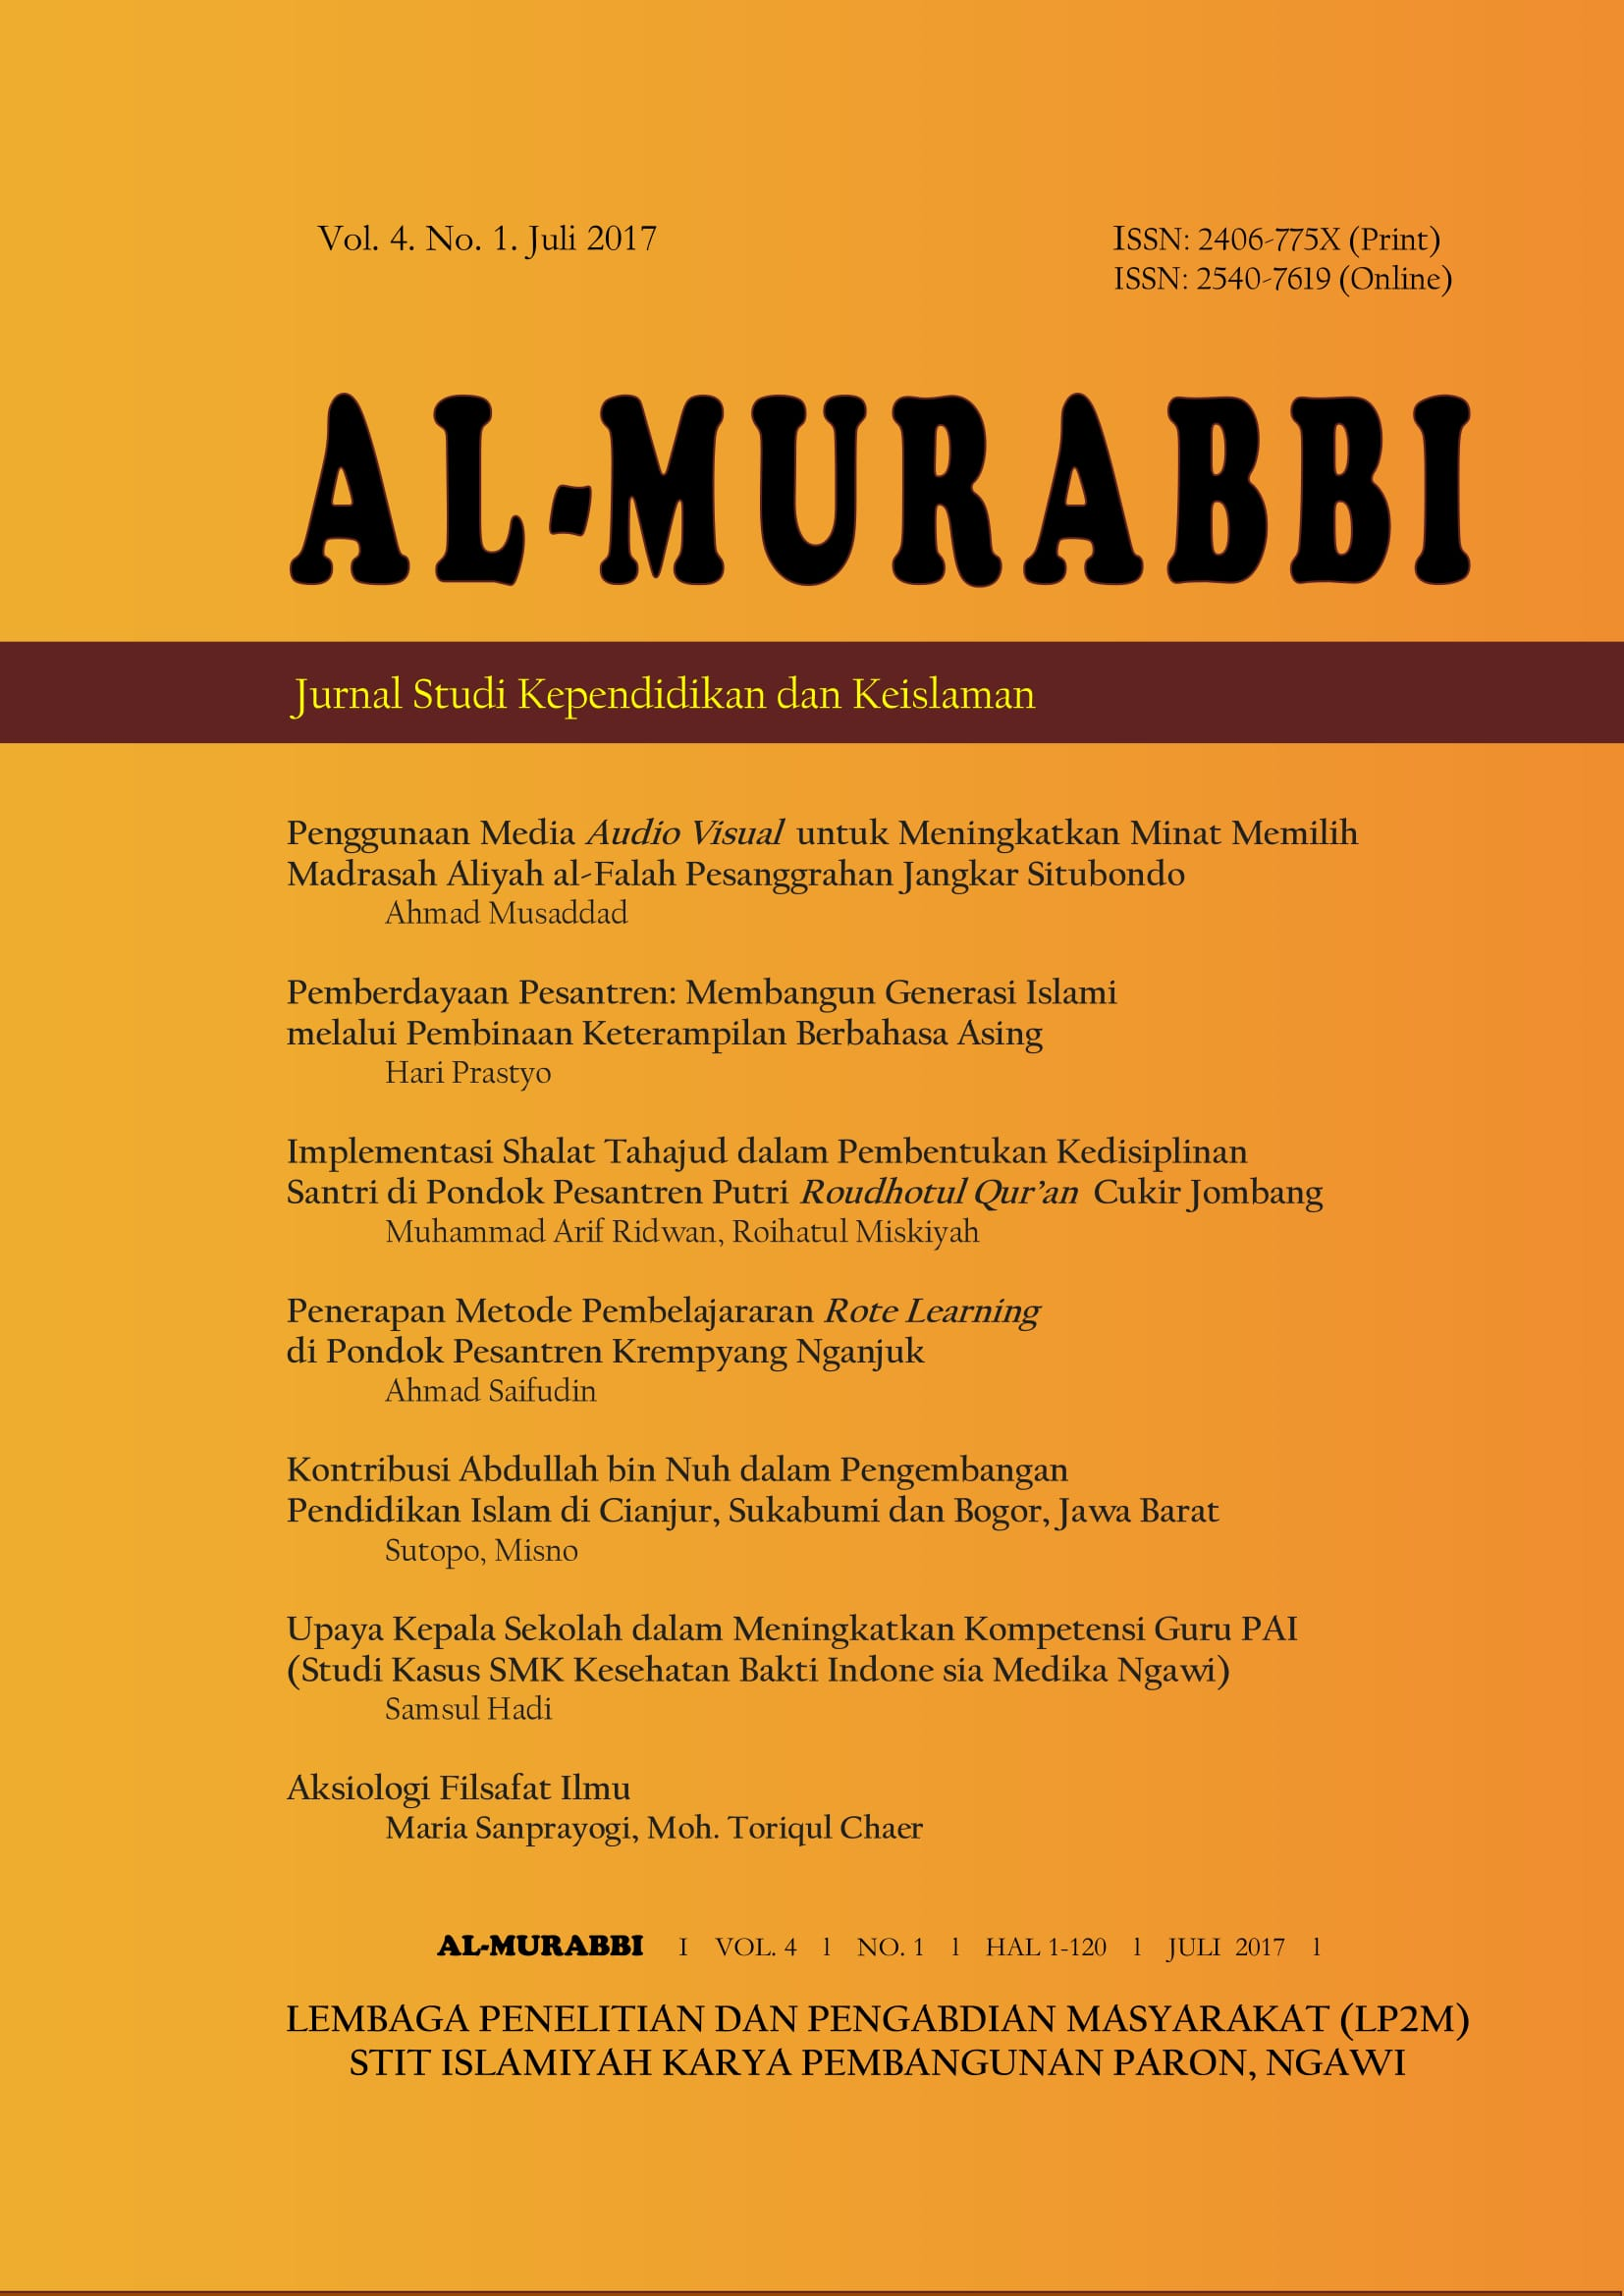 Aksiologi Filsafat Ilmu Dalam Pengembangan Keilmuan Al Murabbi Jurnal Studi Kependidikan Dan Keislaman